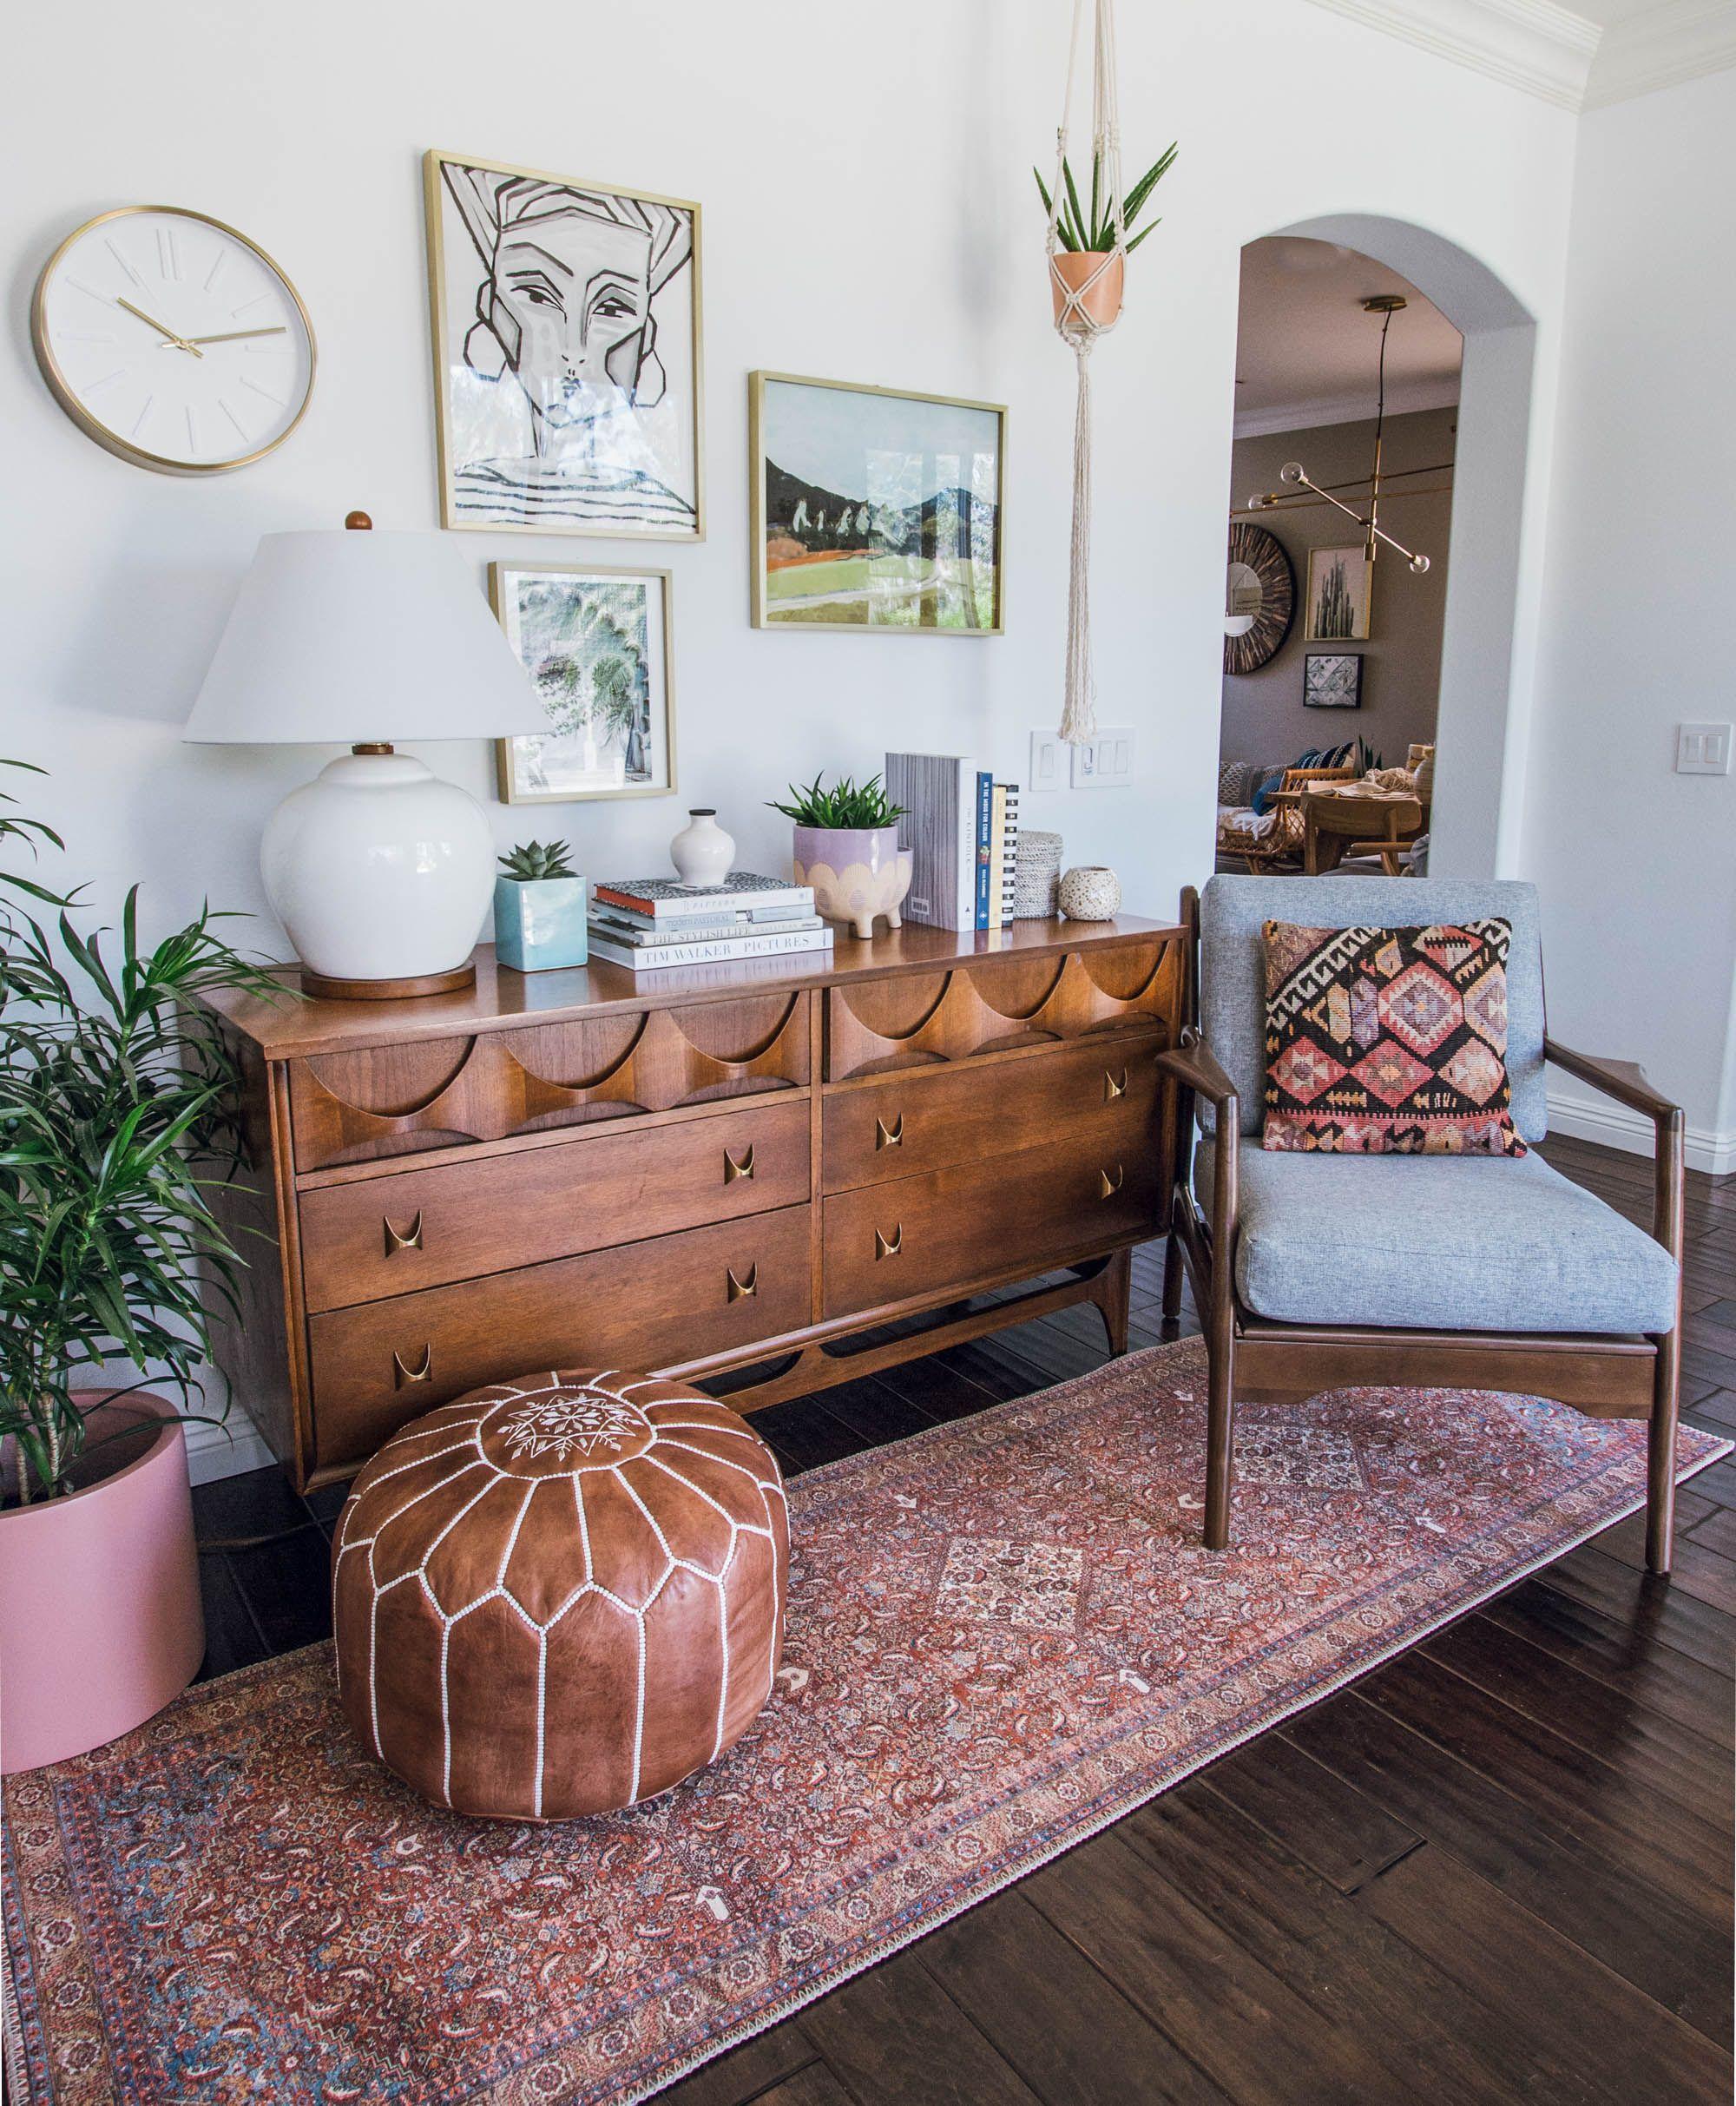 Broyhill brasilia mid century modern furniture loloi ...